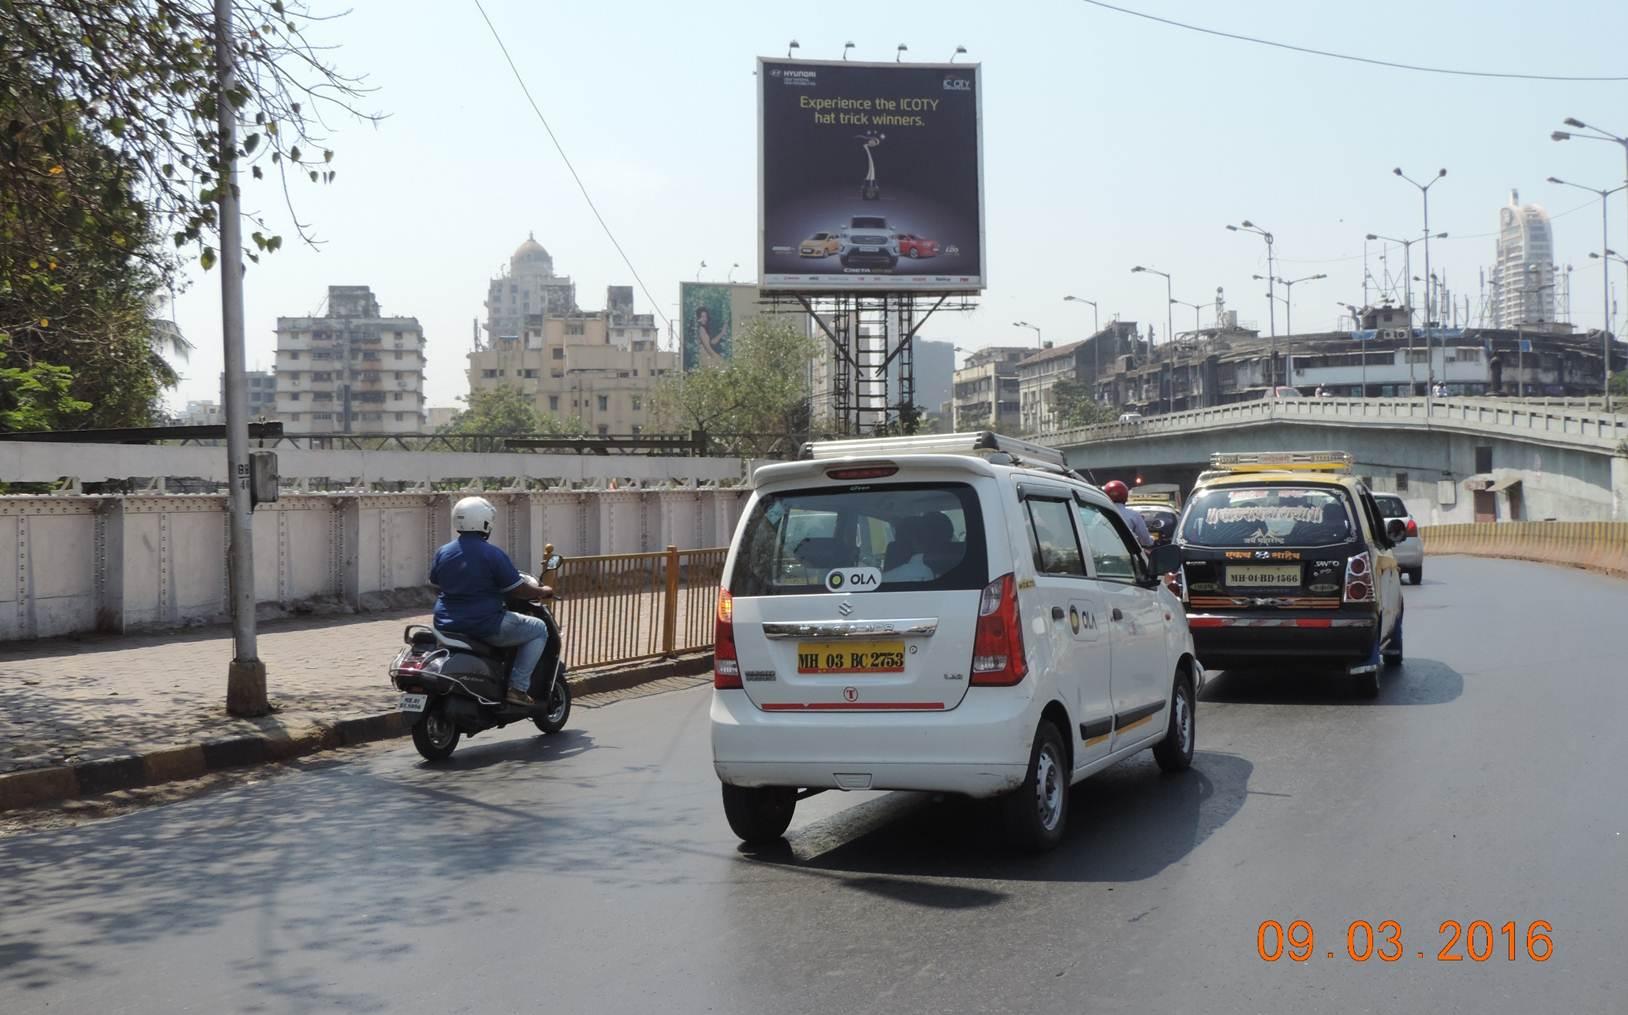 Byculla Flyover Mt , Mumbai